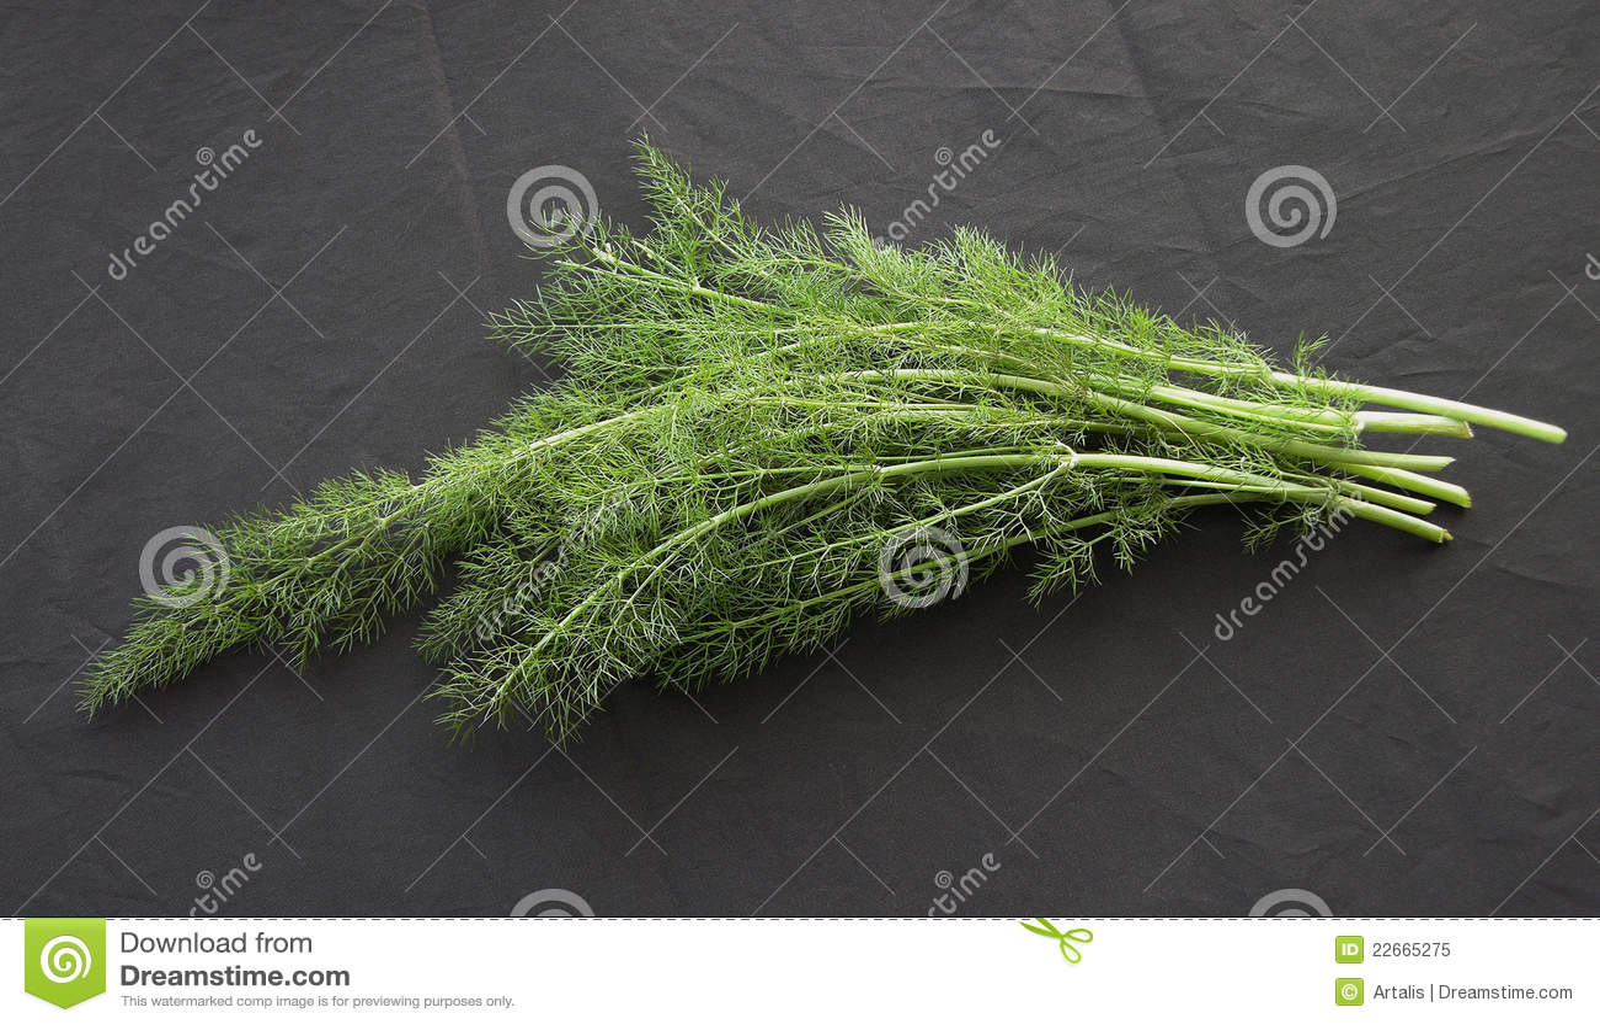 фенхель трава фото